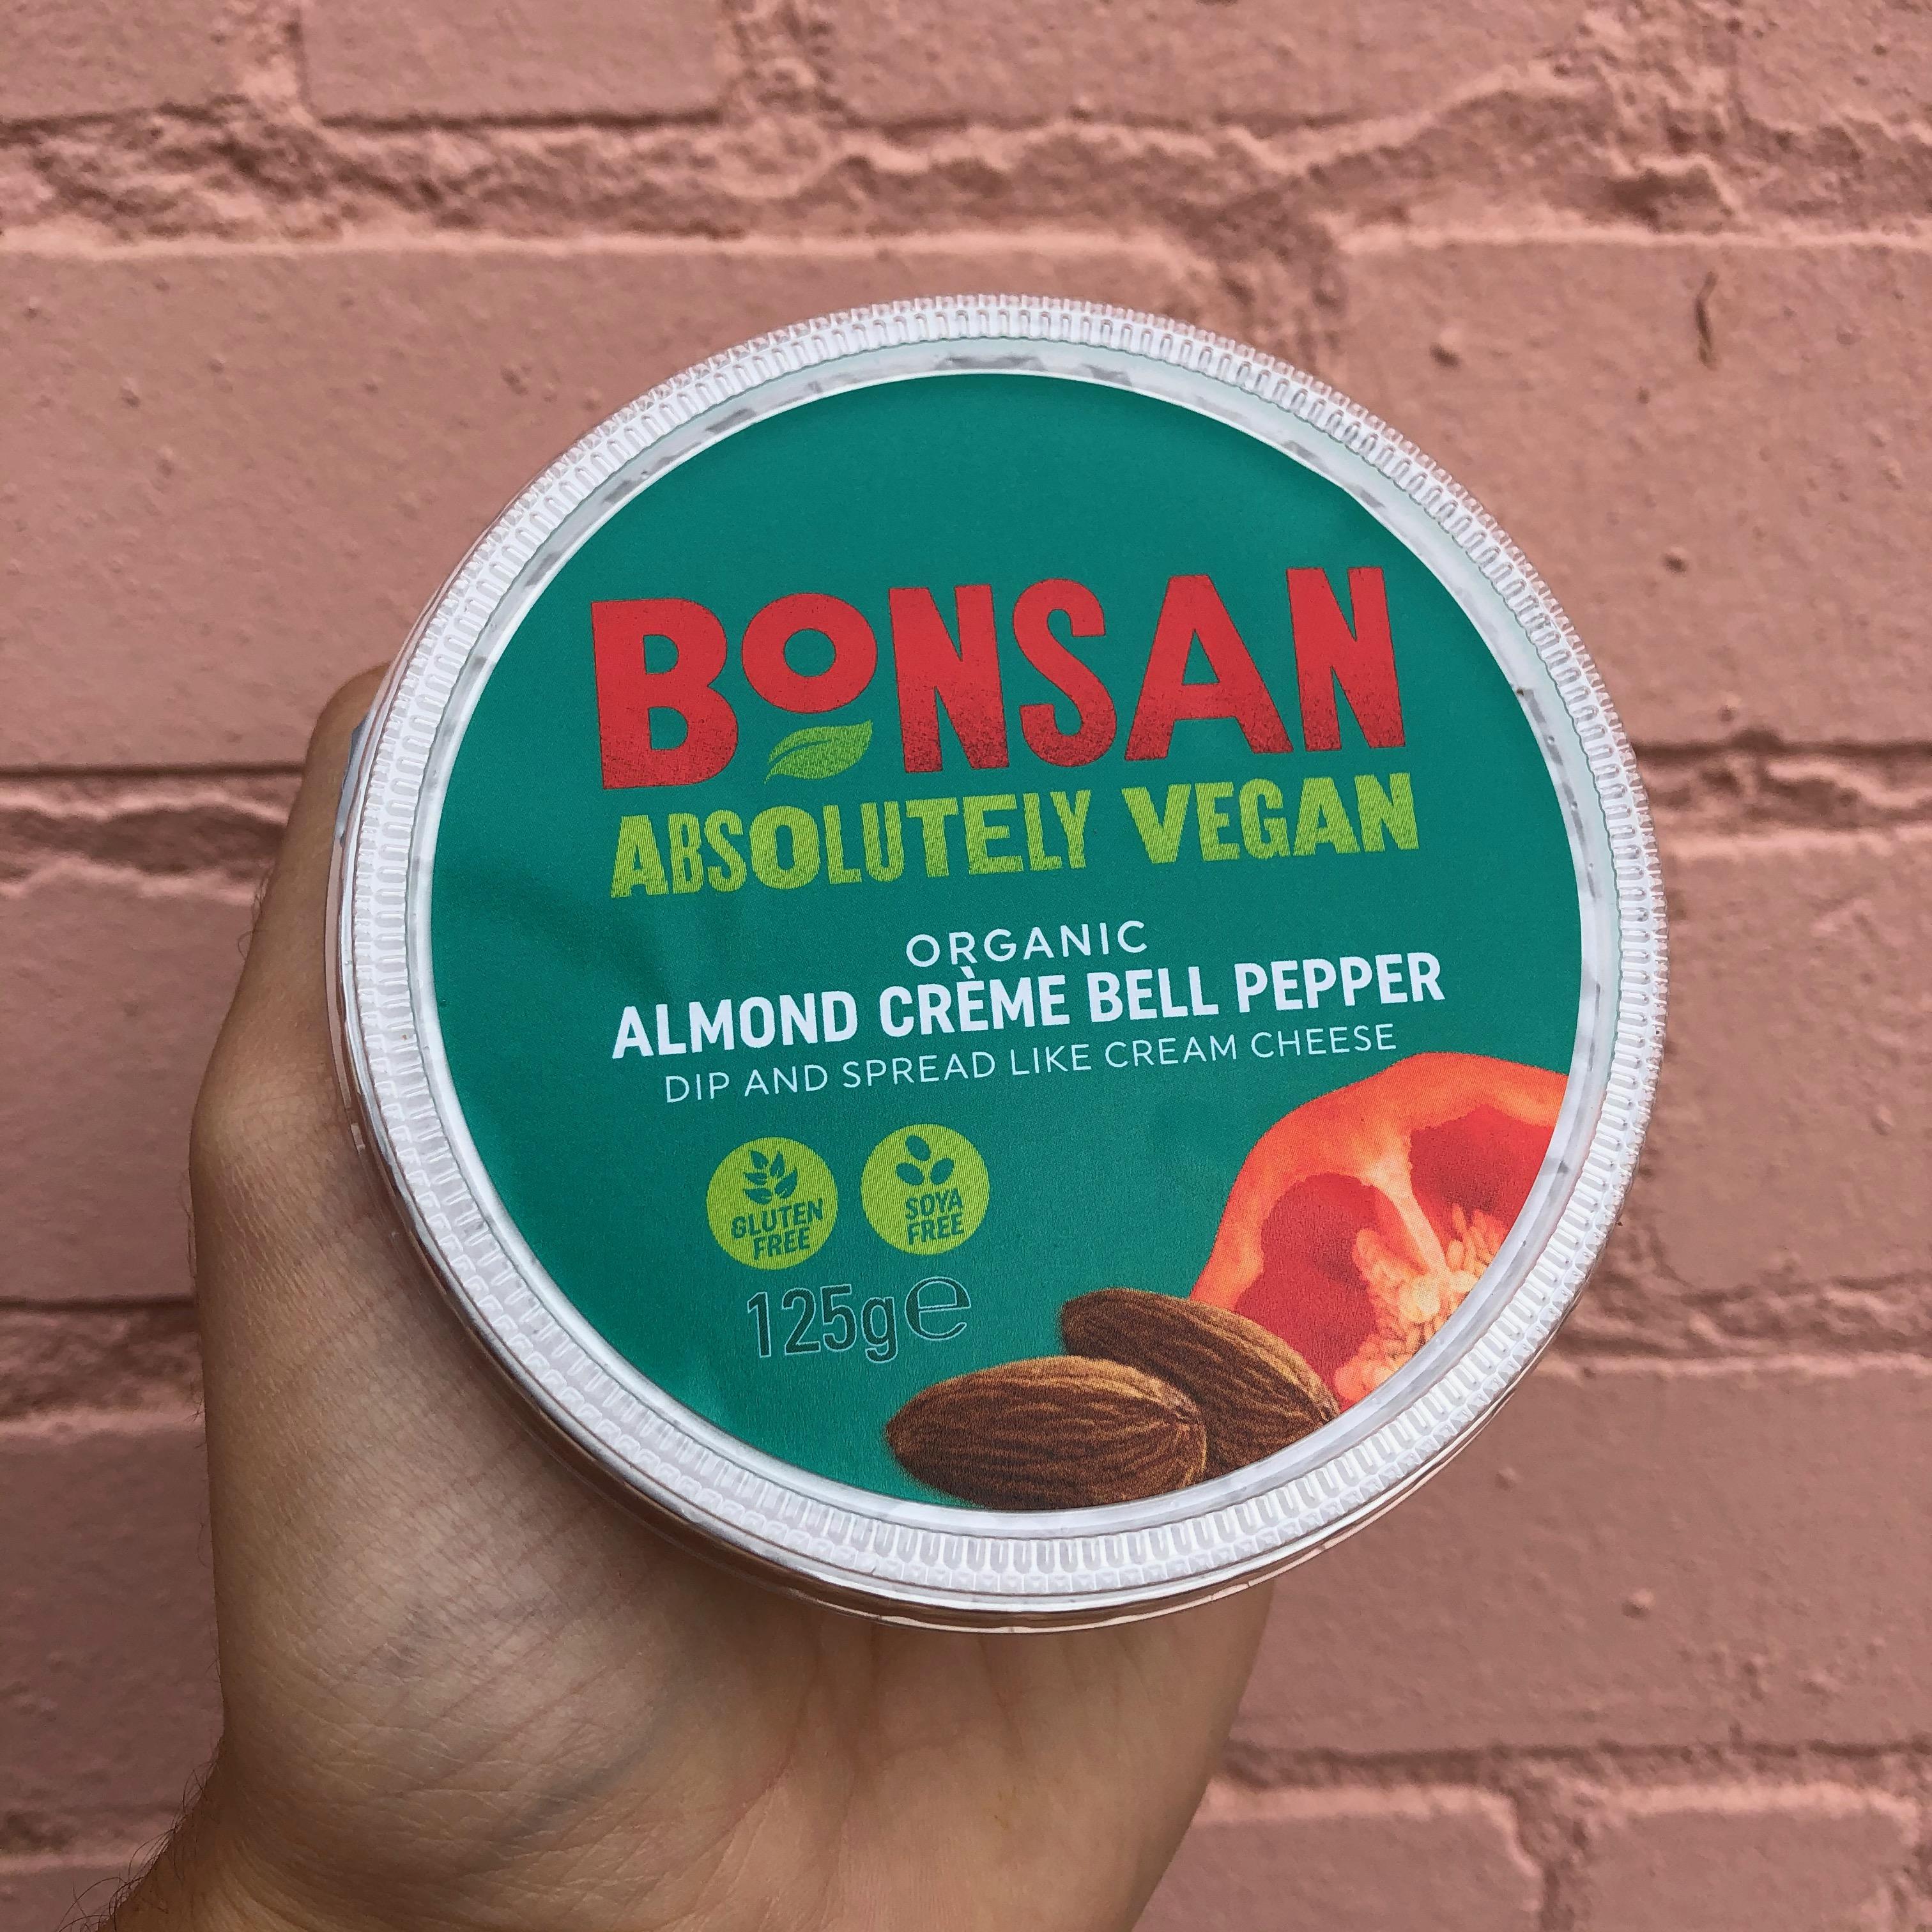 Bonsan Almond Creme Bell Pepper Dip